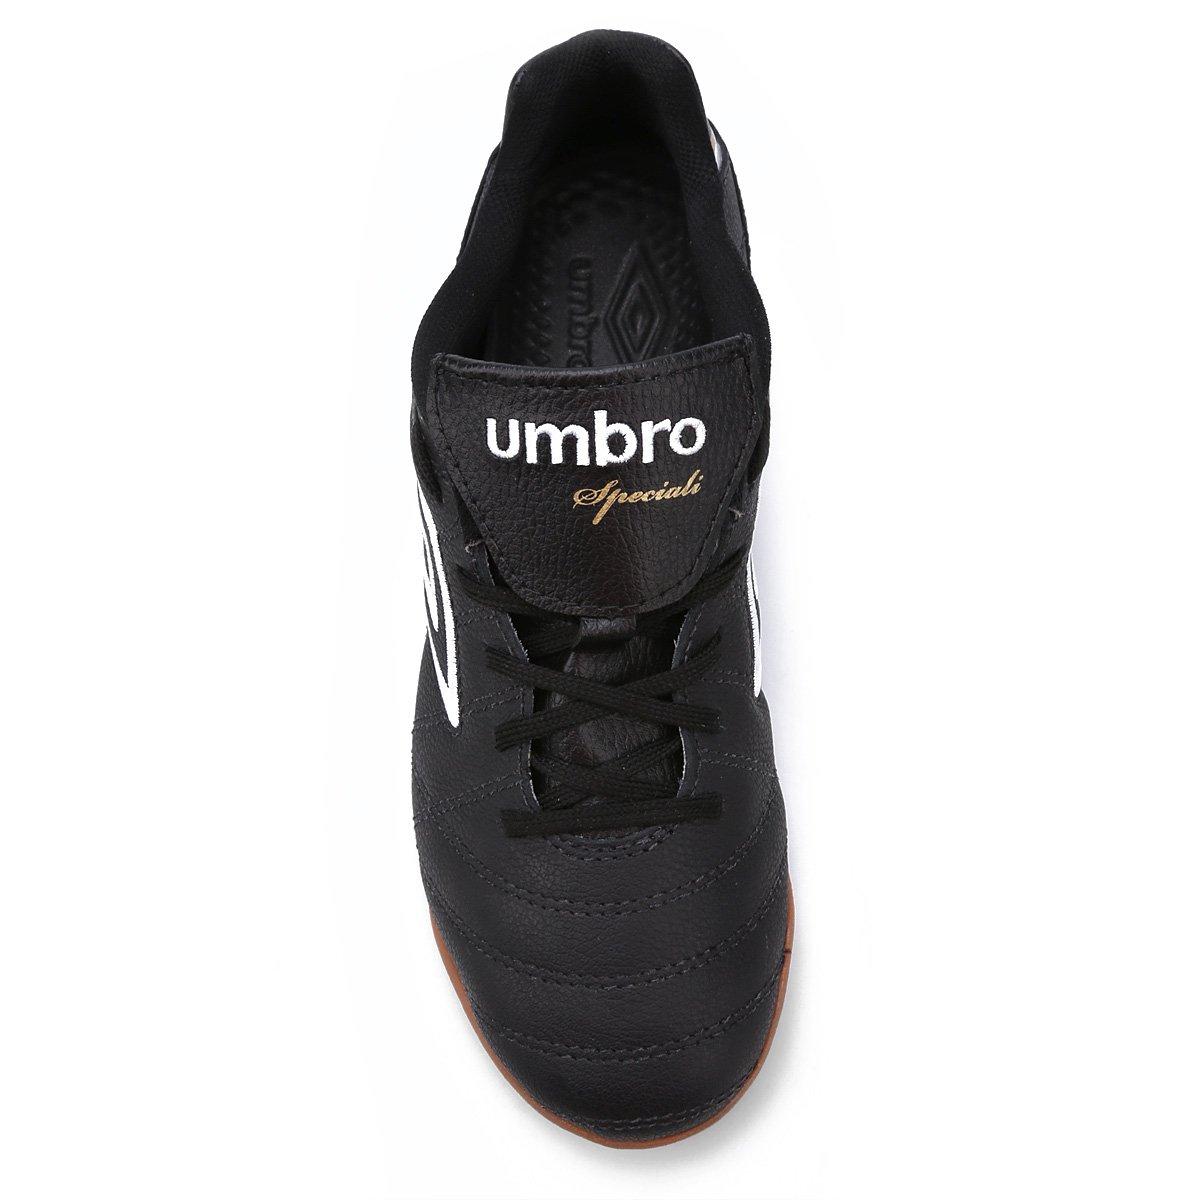 Chuteira Preto Speciali Futsal Branco Chuteira e Umbro Premier Futsal Masculina dTUvOqvw6